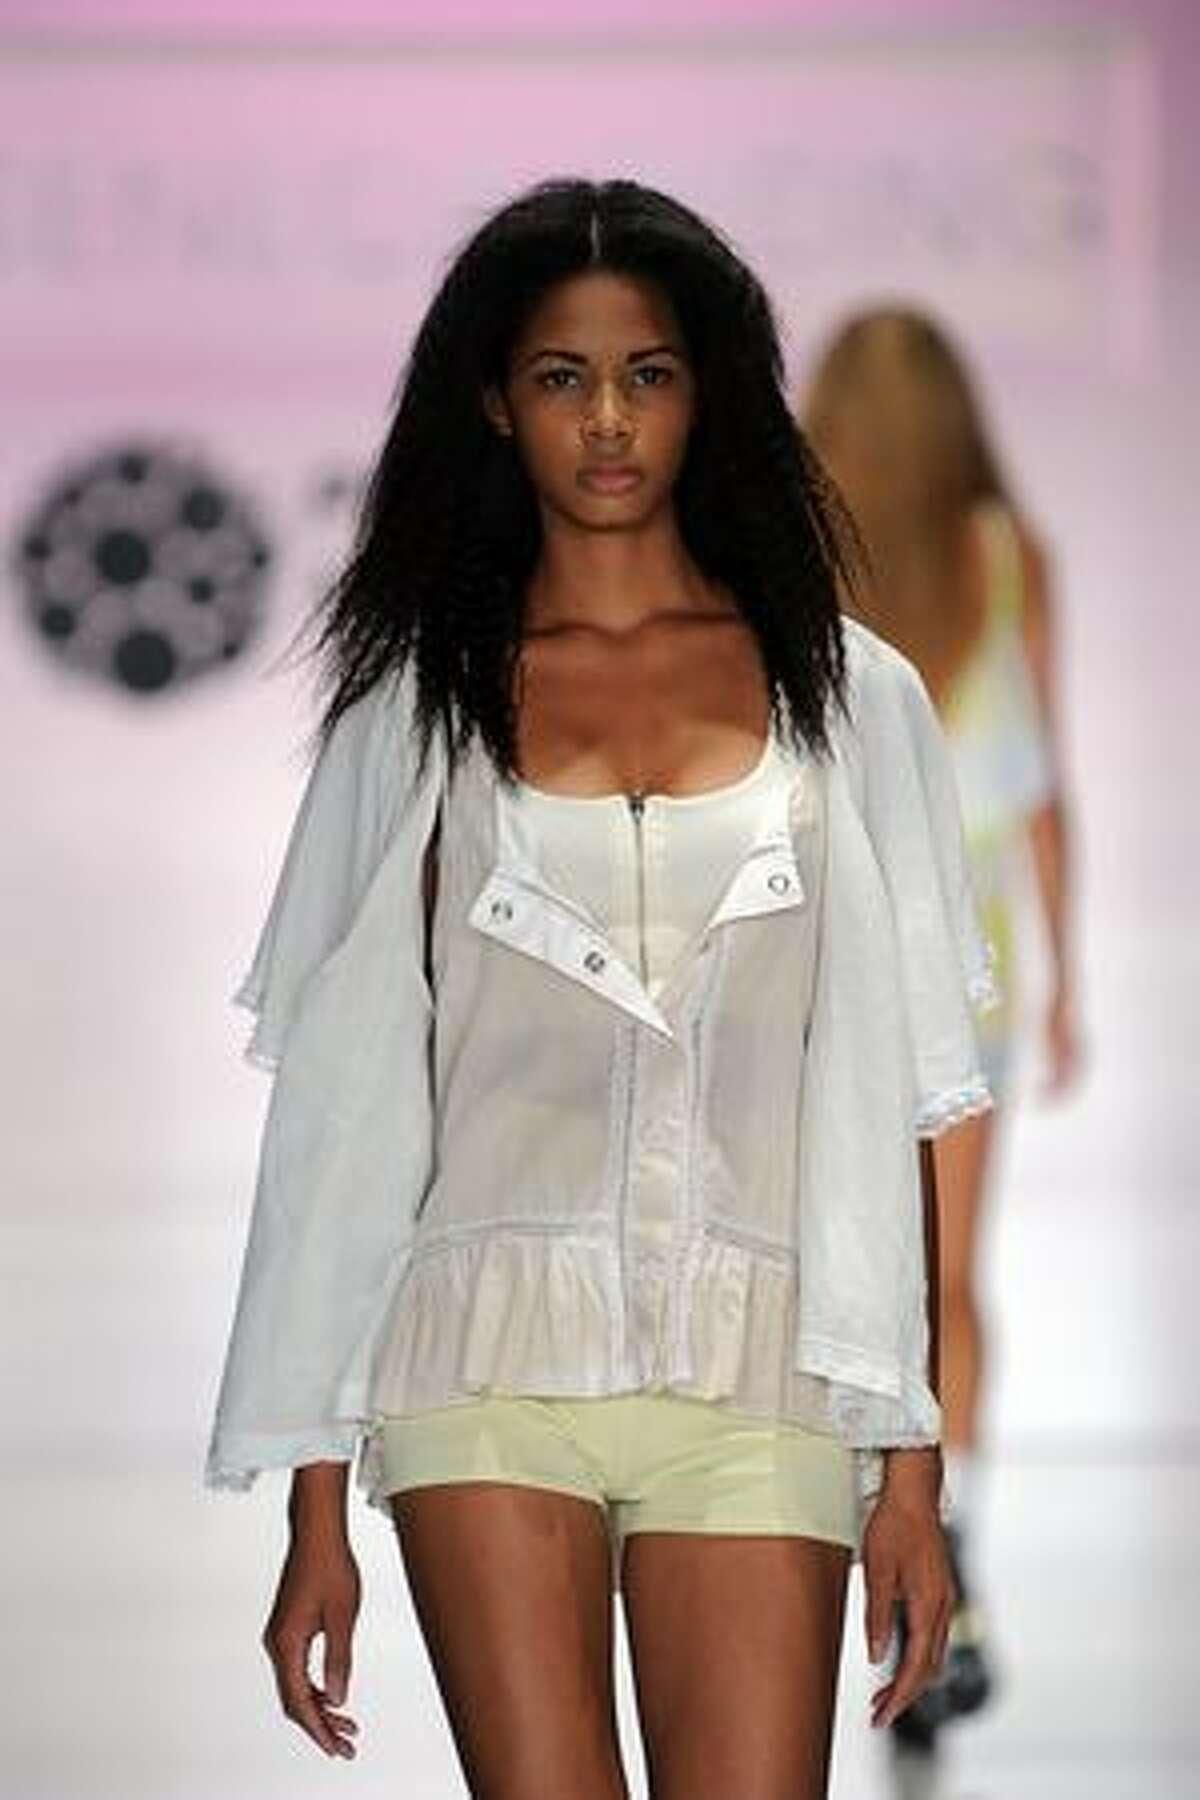 A model wears Seneca Rising on the runway at Gen Art's 12th Annual